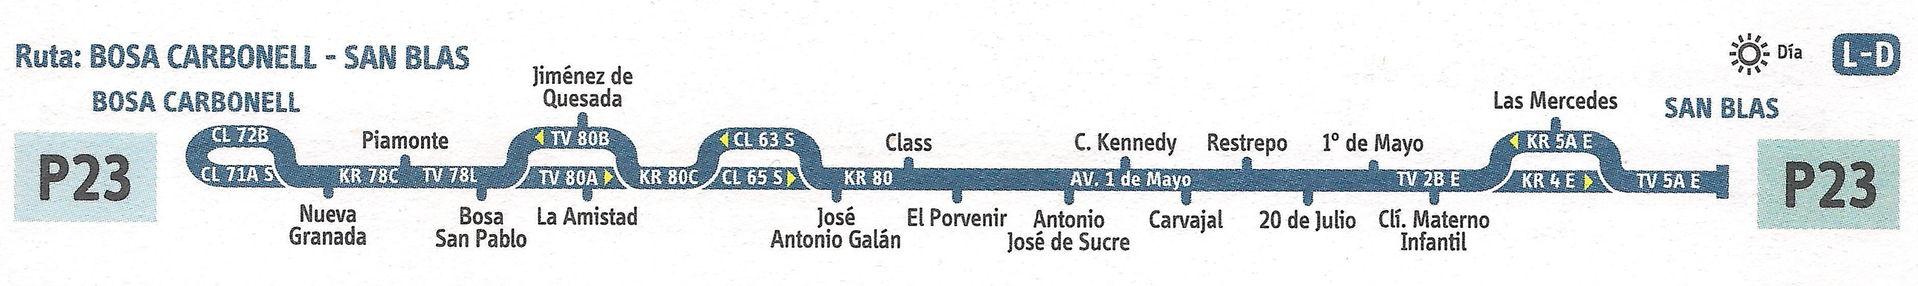 Ruta SITP: P23 Bosa Carbonell ↔ San Blas [Urbana]